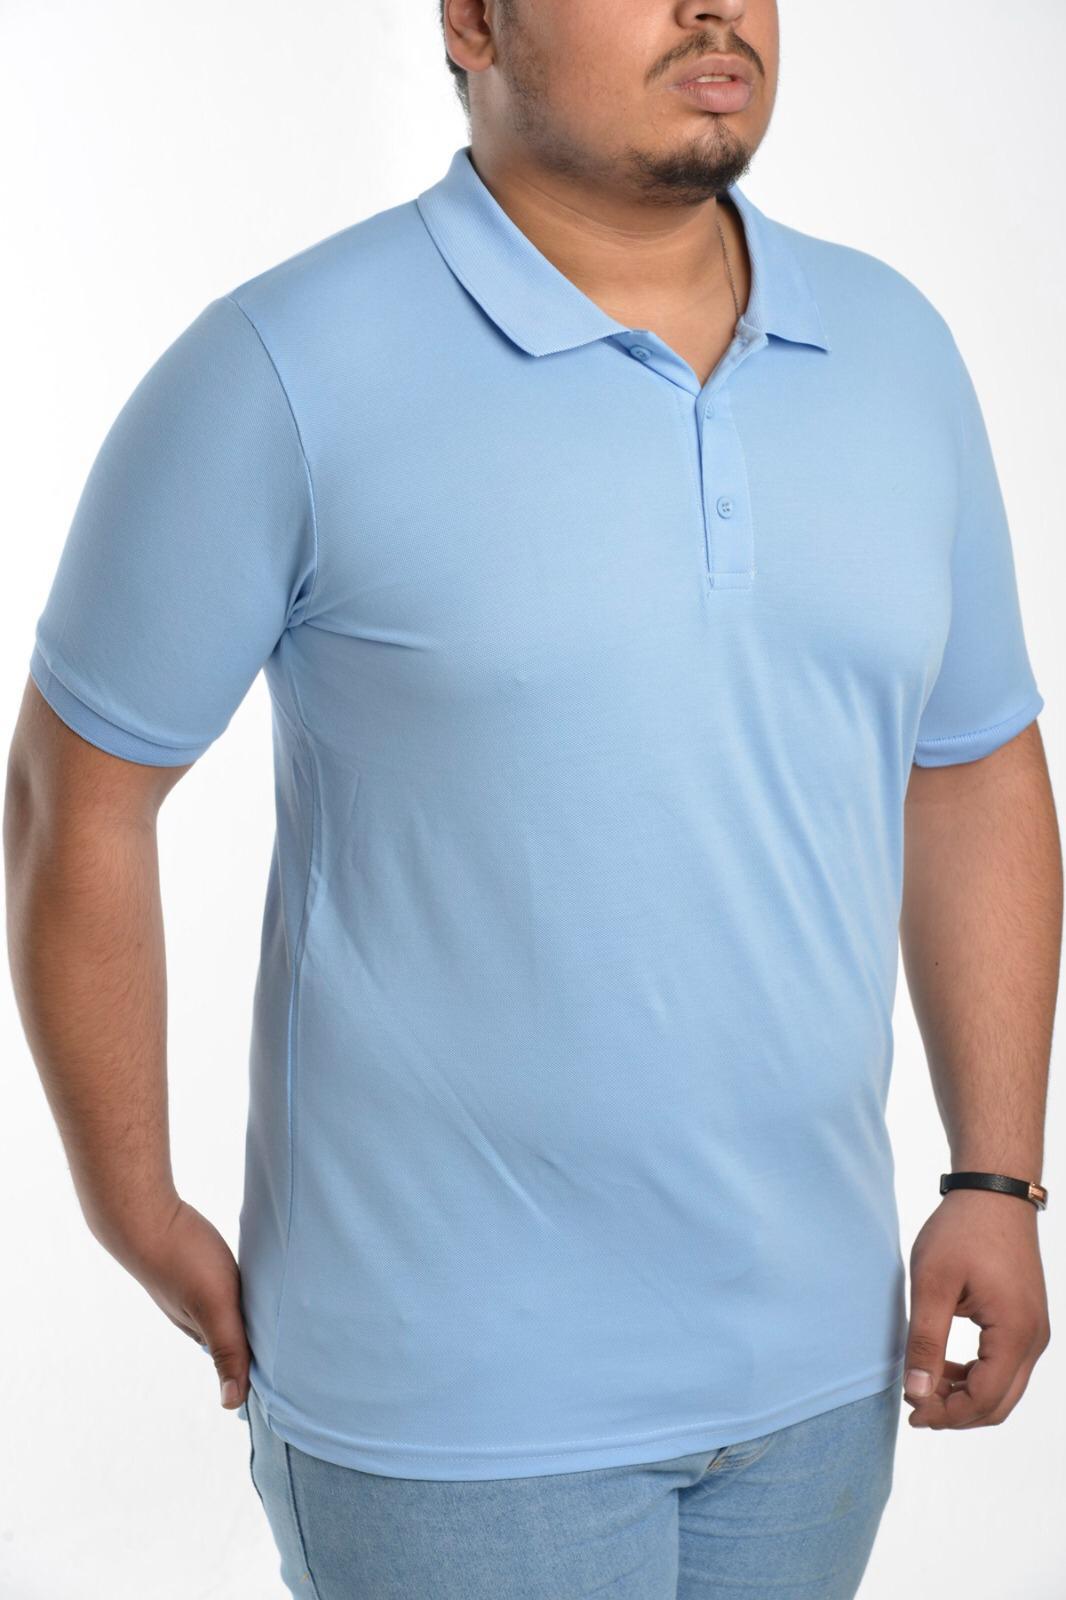 Big Size Men's T-Shirt